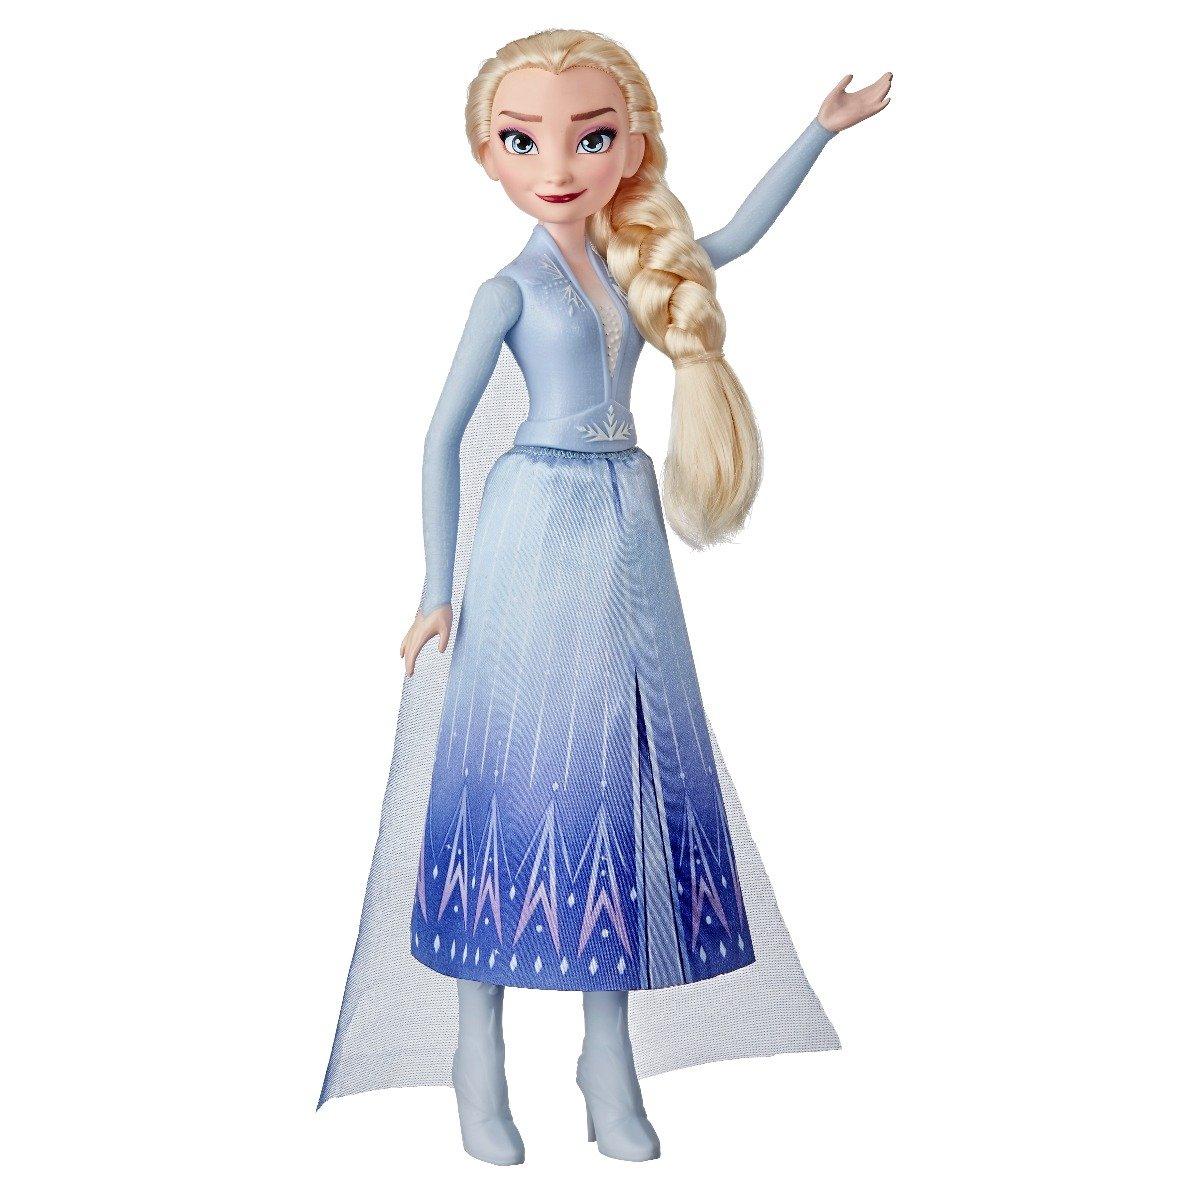 Papusa Disney Frozen 2, Elsa, 28 cm